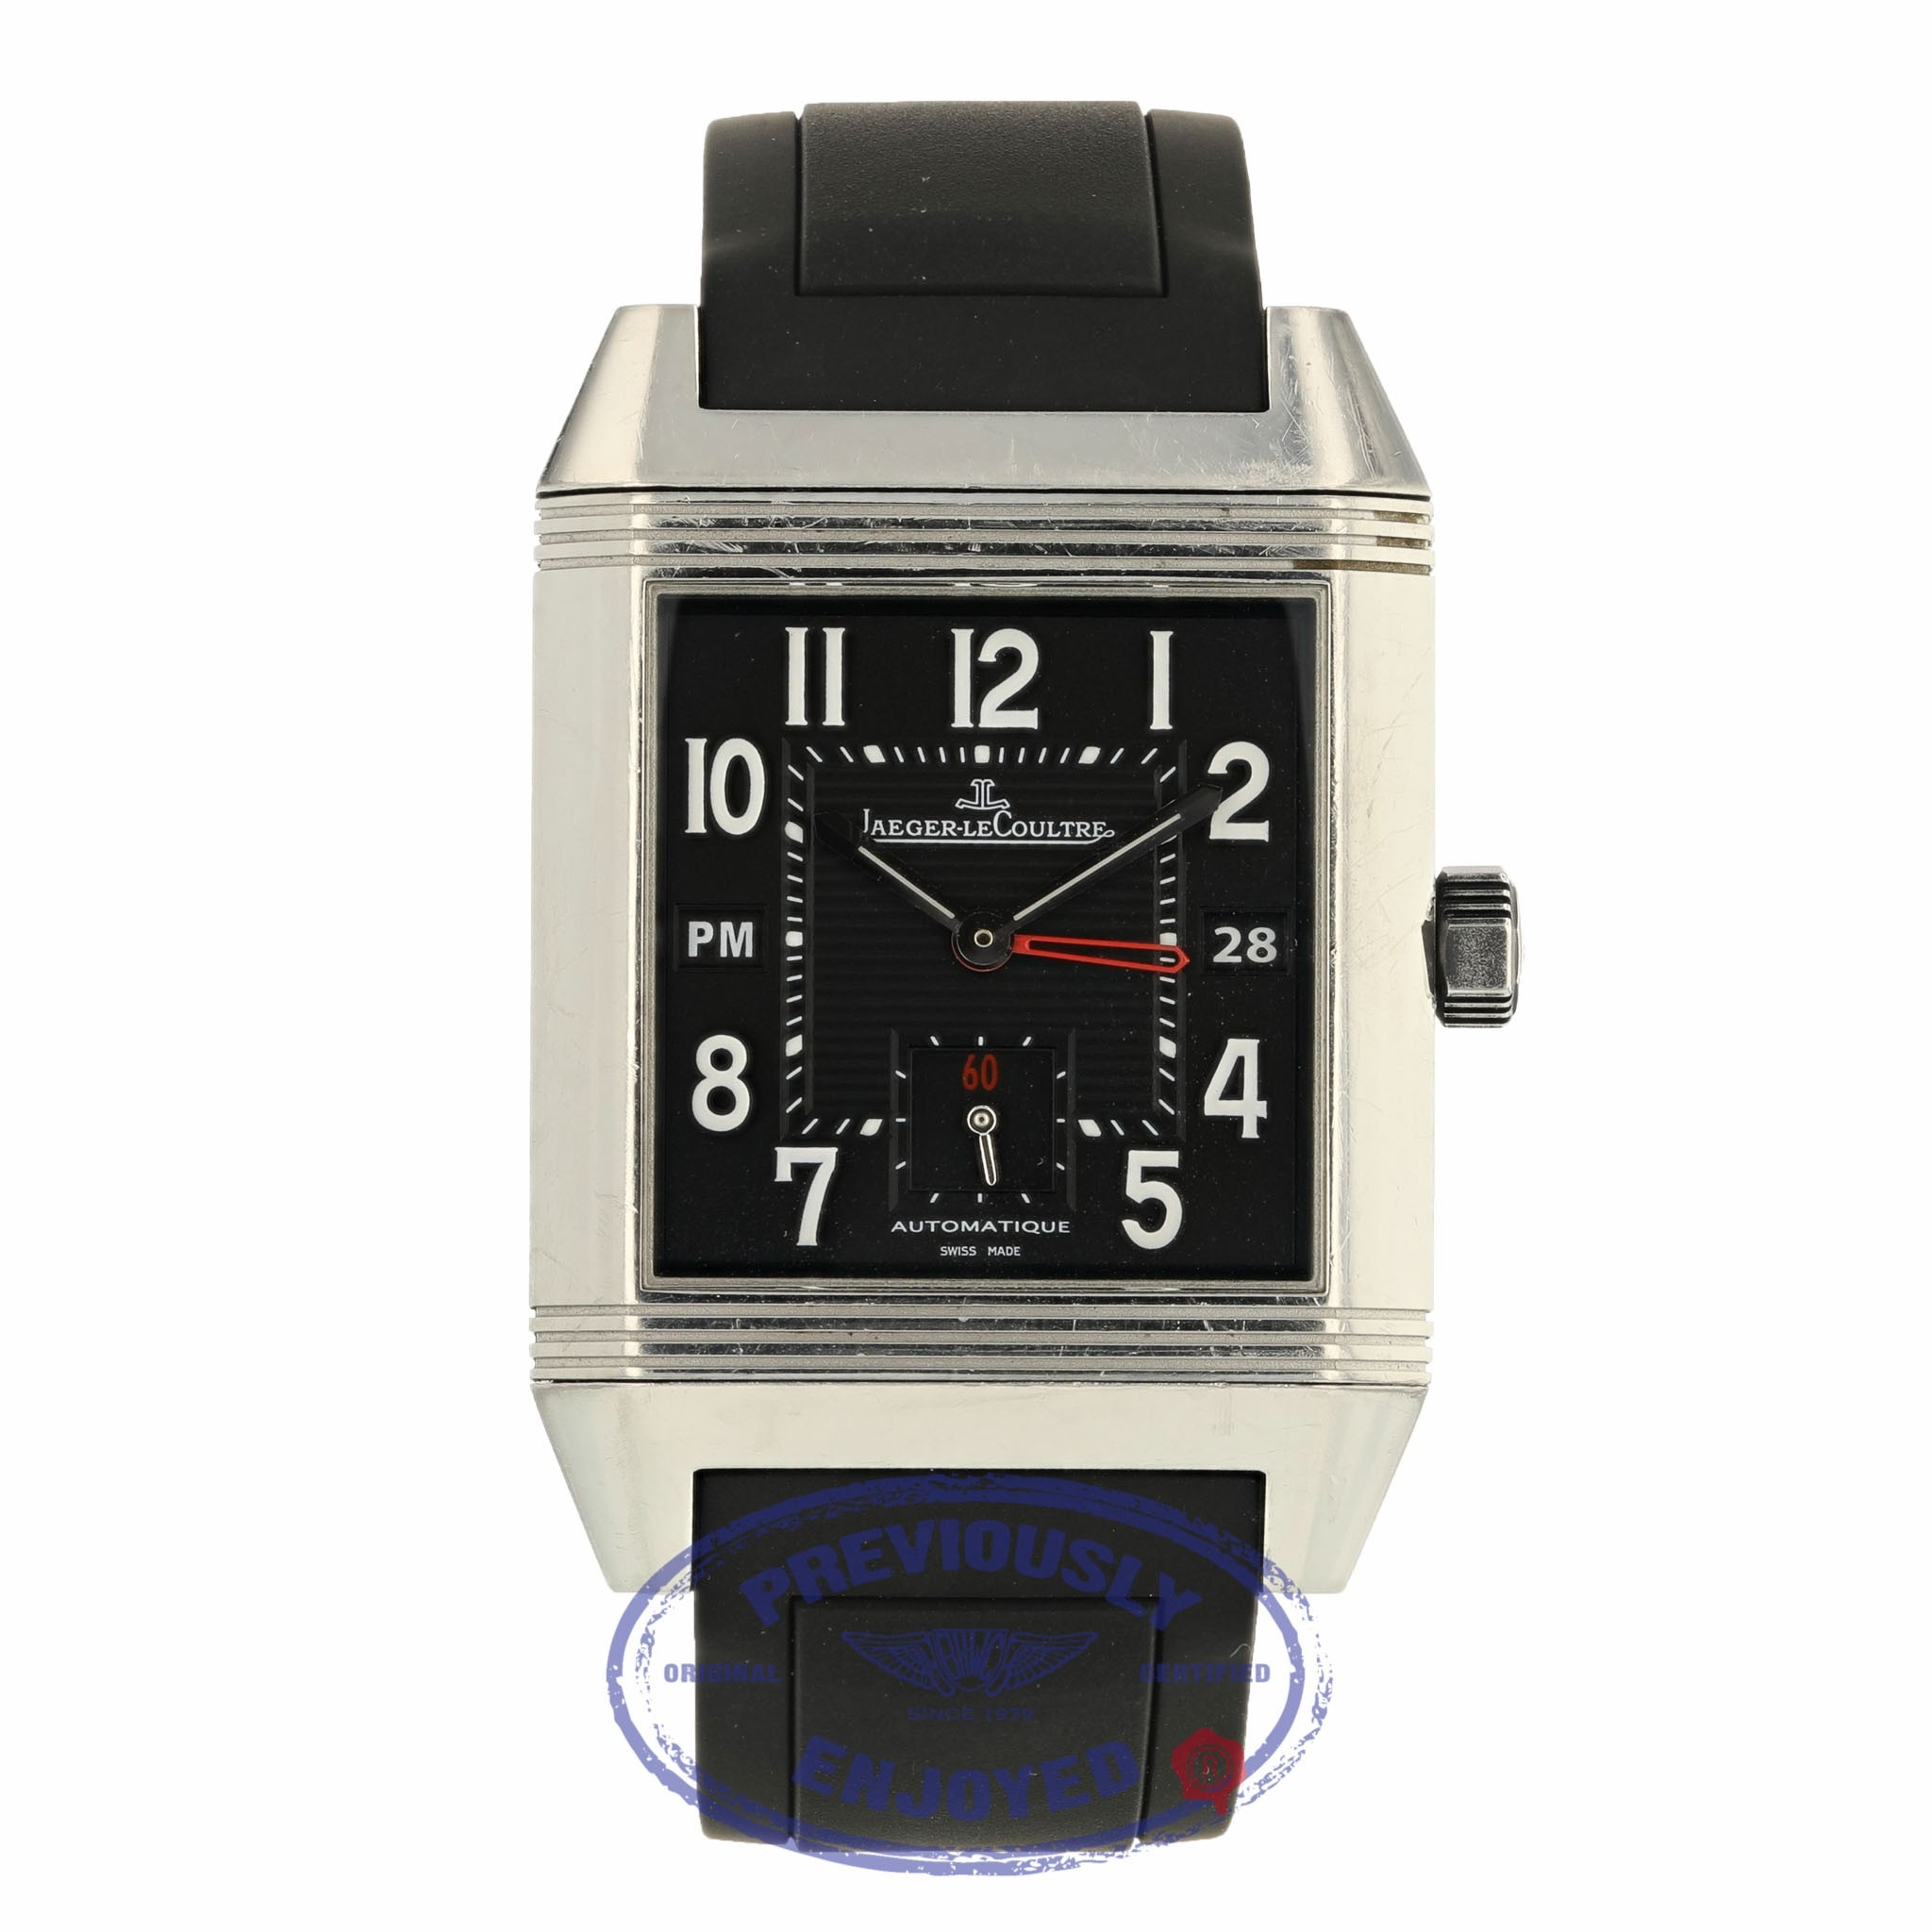 Jaeger LeCoultre Squadra Reverso Hometime Q7008620 J7489K - Beverly Hills Watch Company